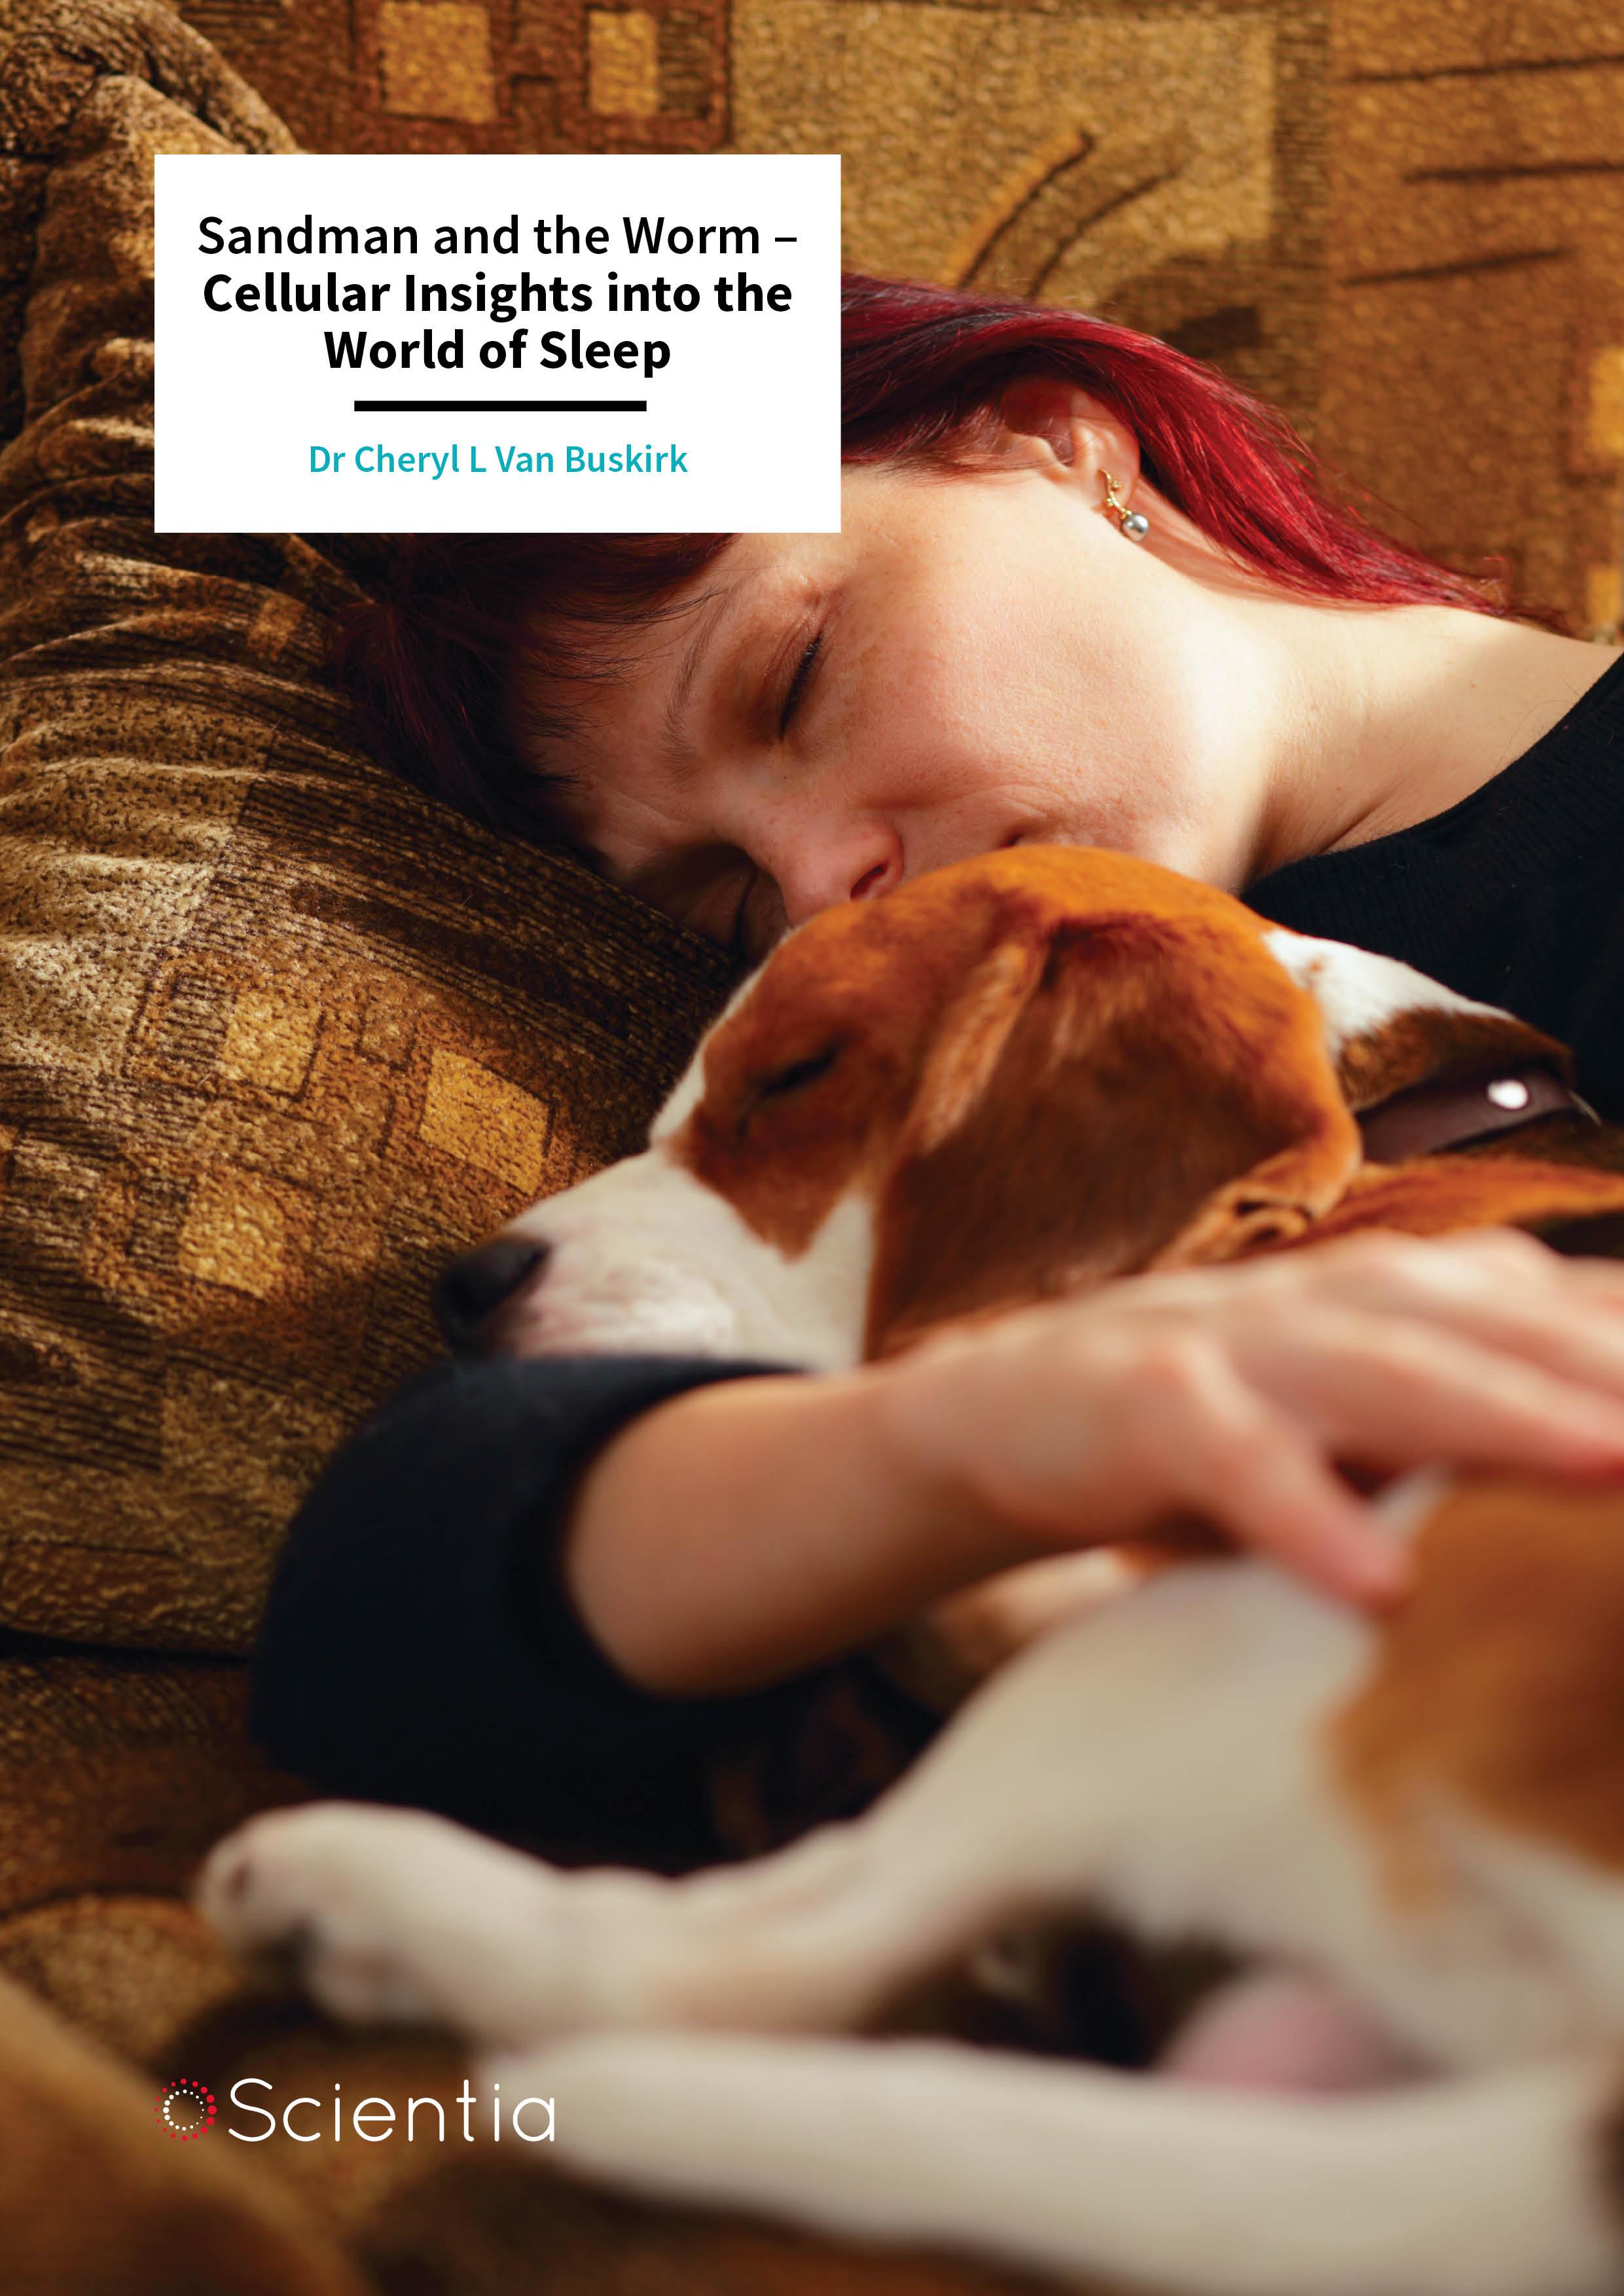 Dr Cheryl Van Buskirk – Sandman and the Worm – Cellular Insights into the World of Sleep